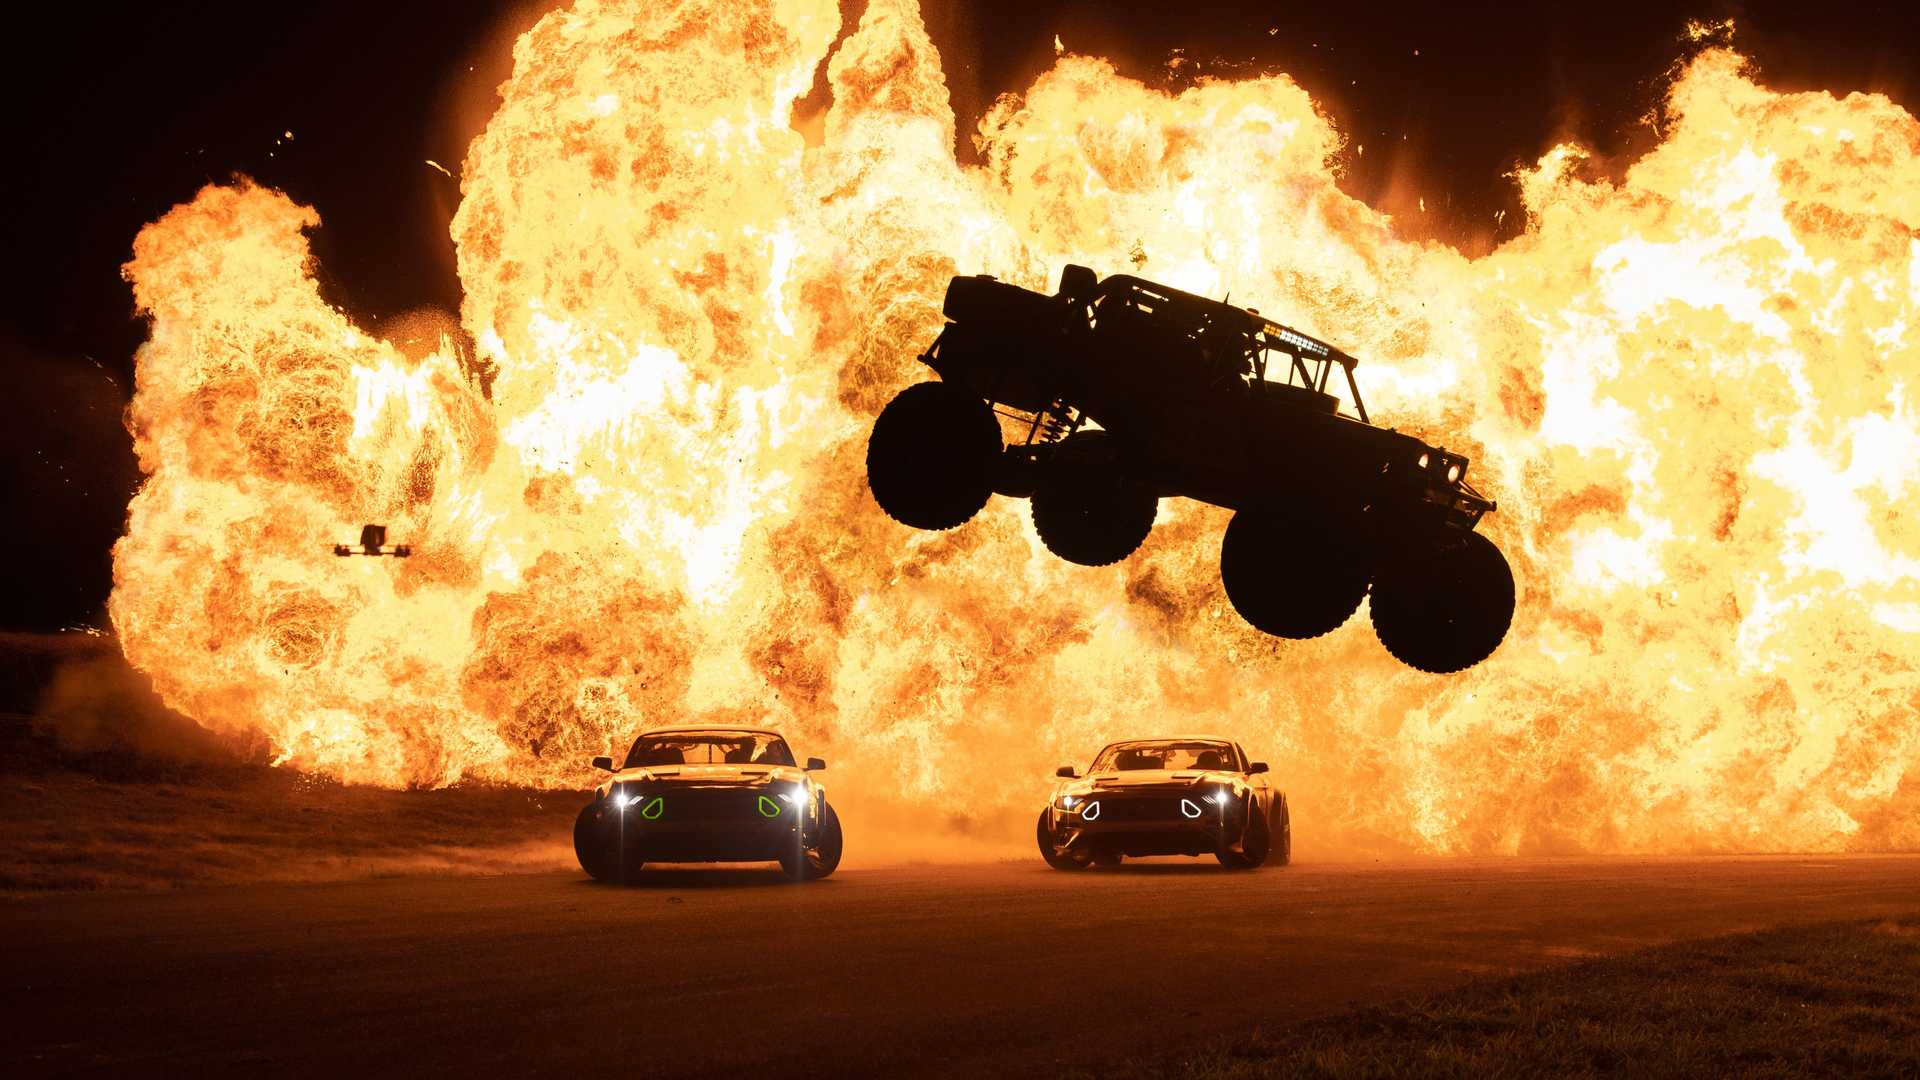 Vaughn Gittin Jr RTR Bomb Track Video Fireball